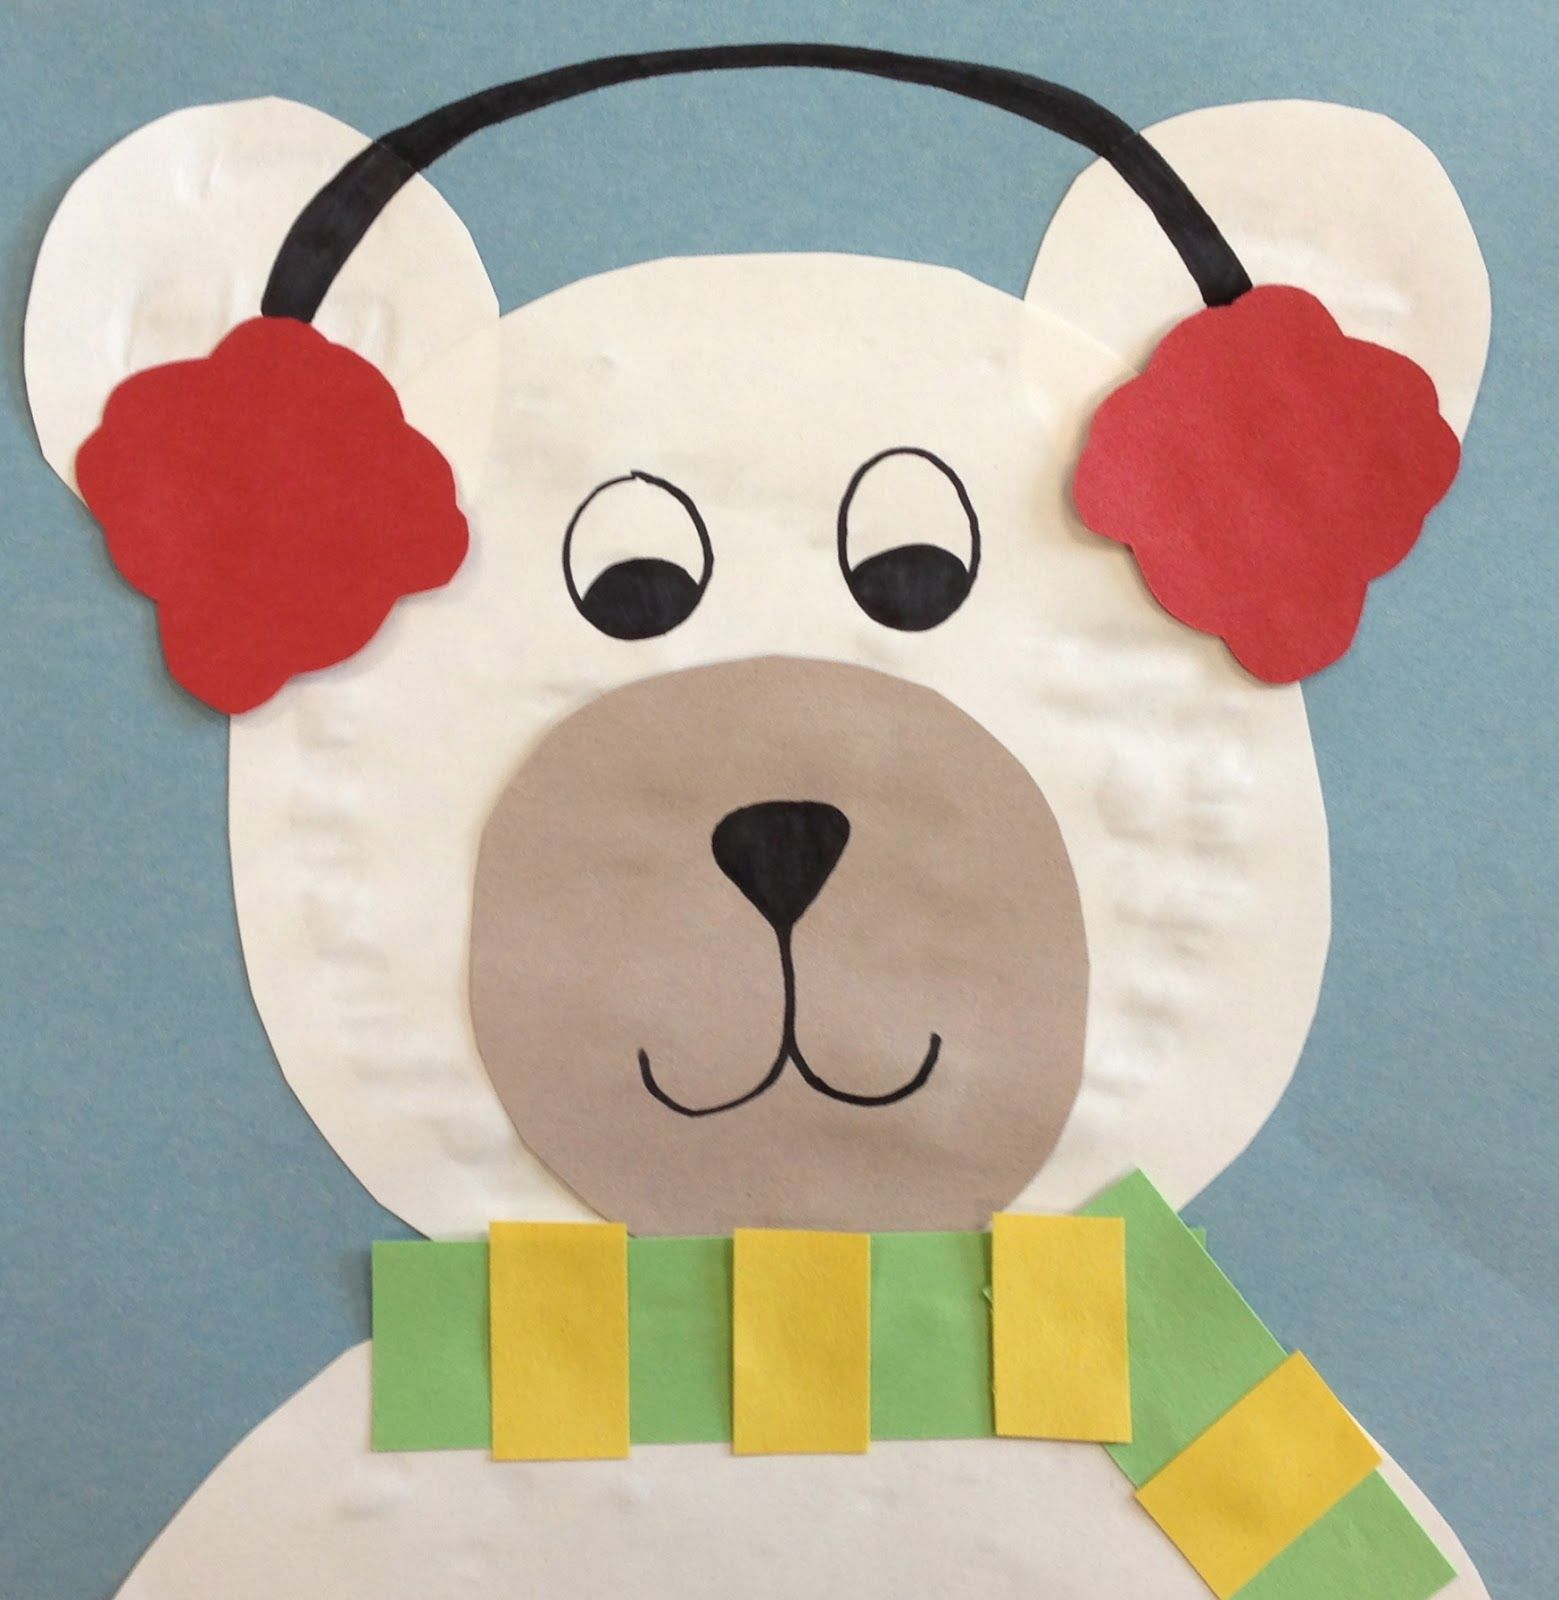 Art Paper Scissors Glue Circles Into Polar Bears